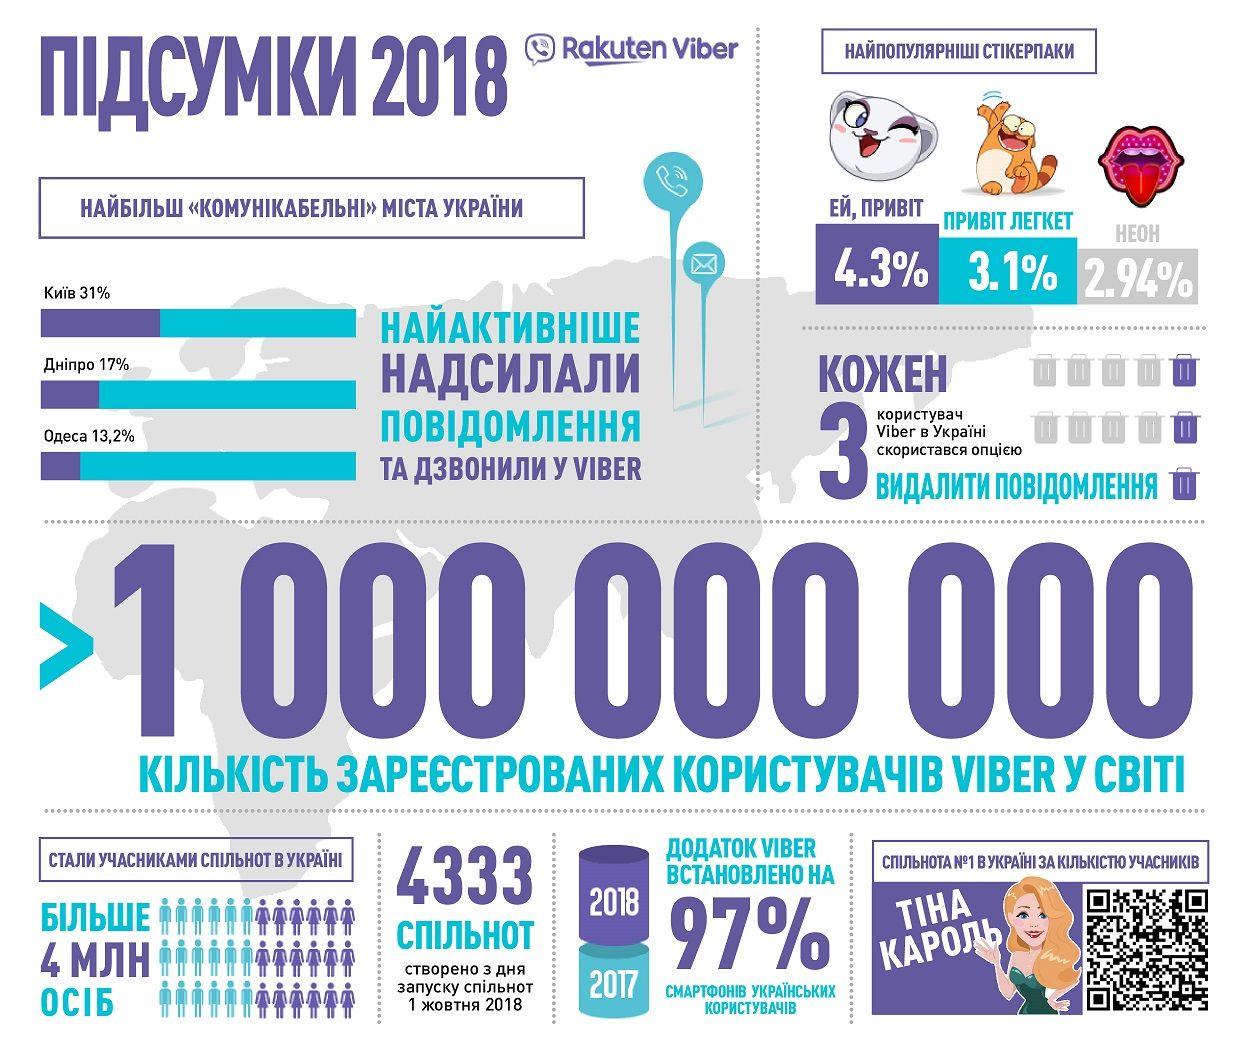 Viber инфографика статистика